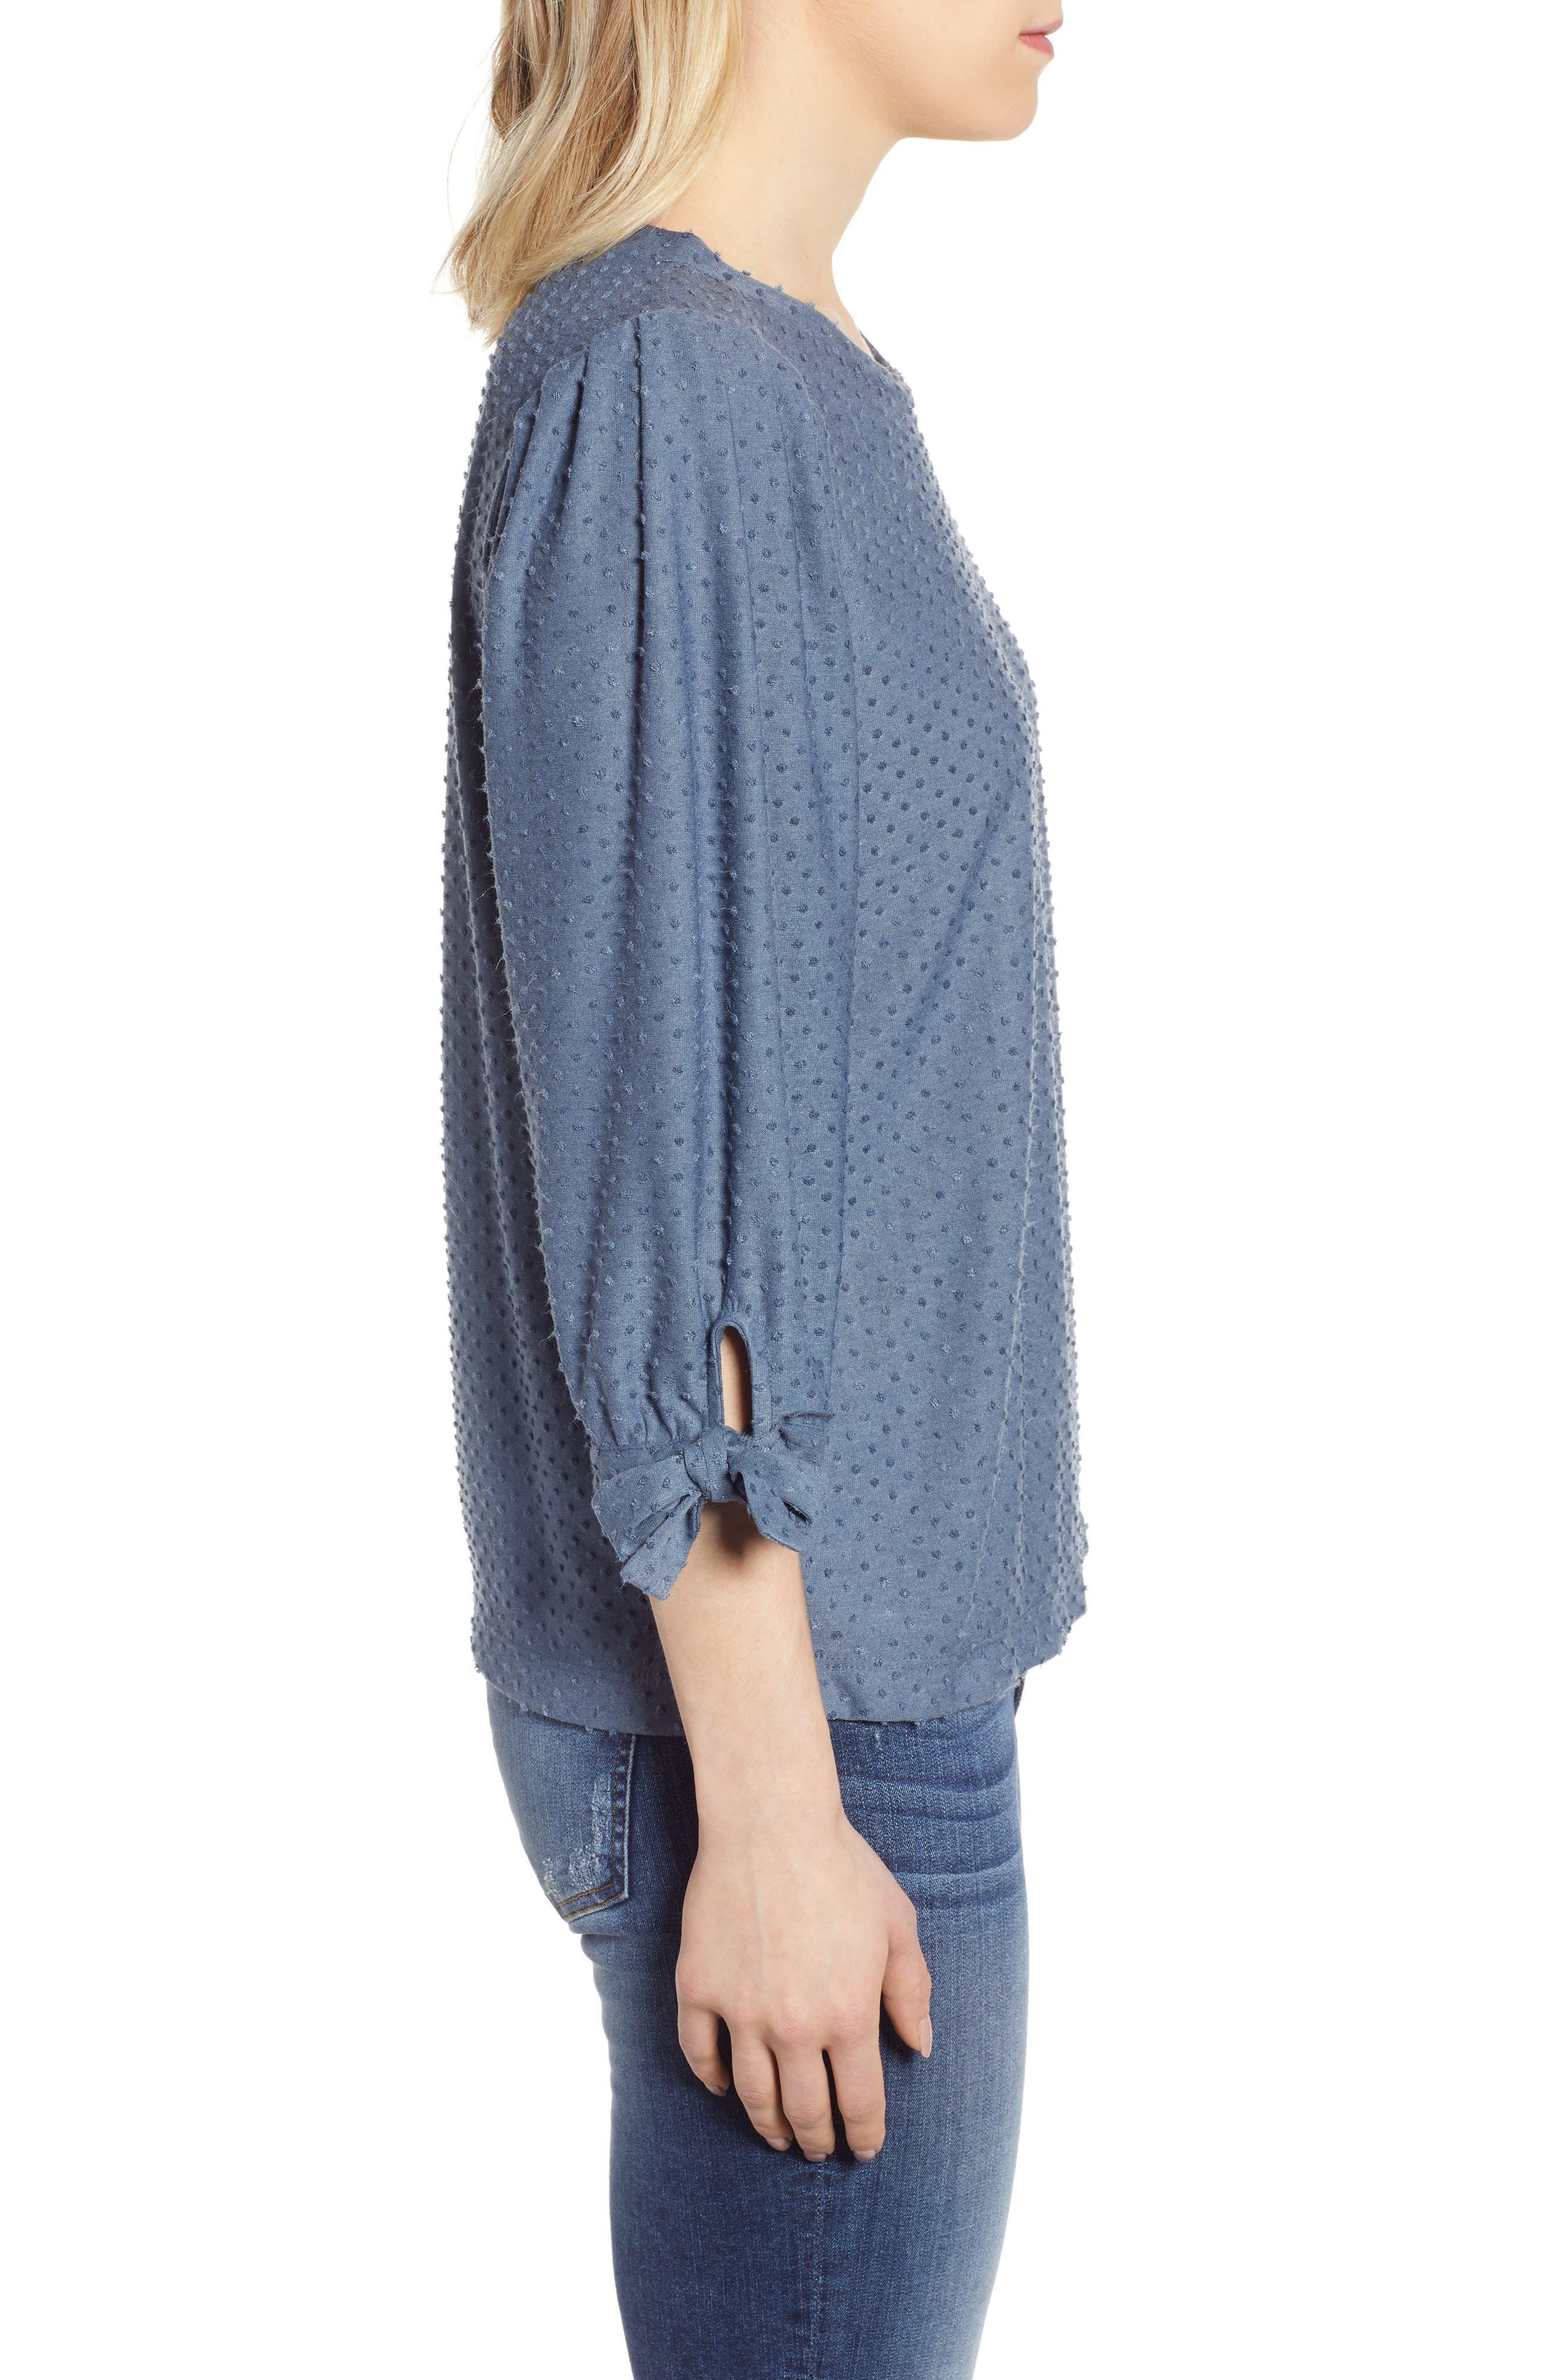 GIBSON, x International Women's Day Ruthie Clip Dot Tie Sleeve Blouse, Alternate thumbnail 3, color, DENIM